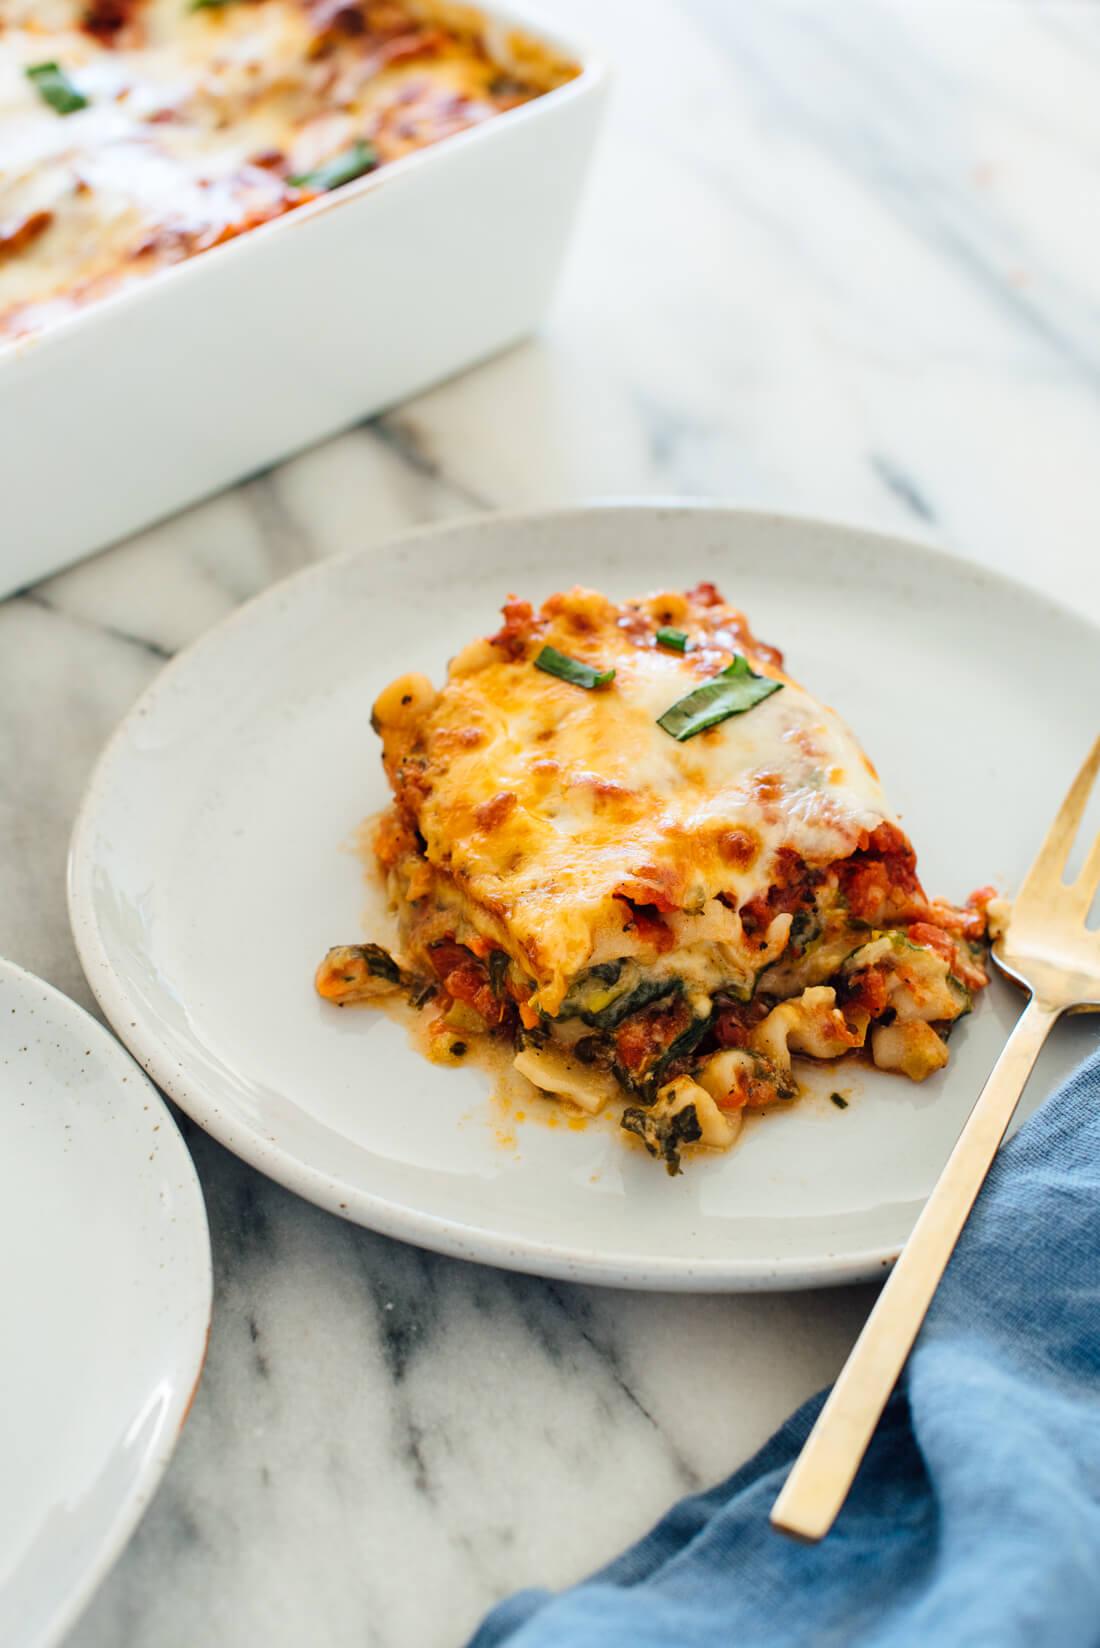 Picture Perfect Vegetable Lasagna Recipe  Easy  Fast Recipes